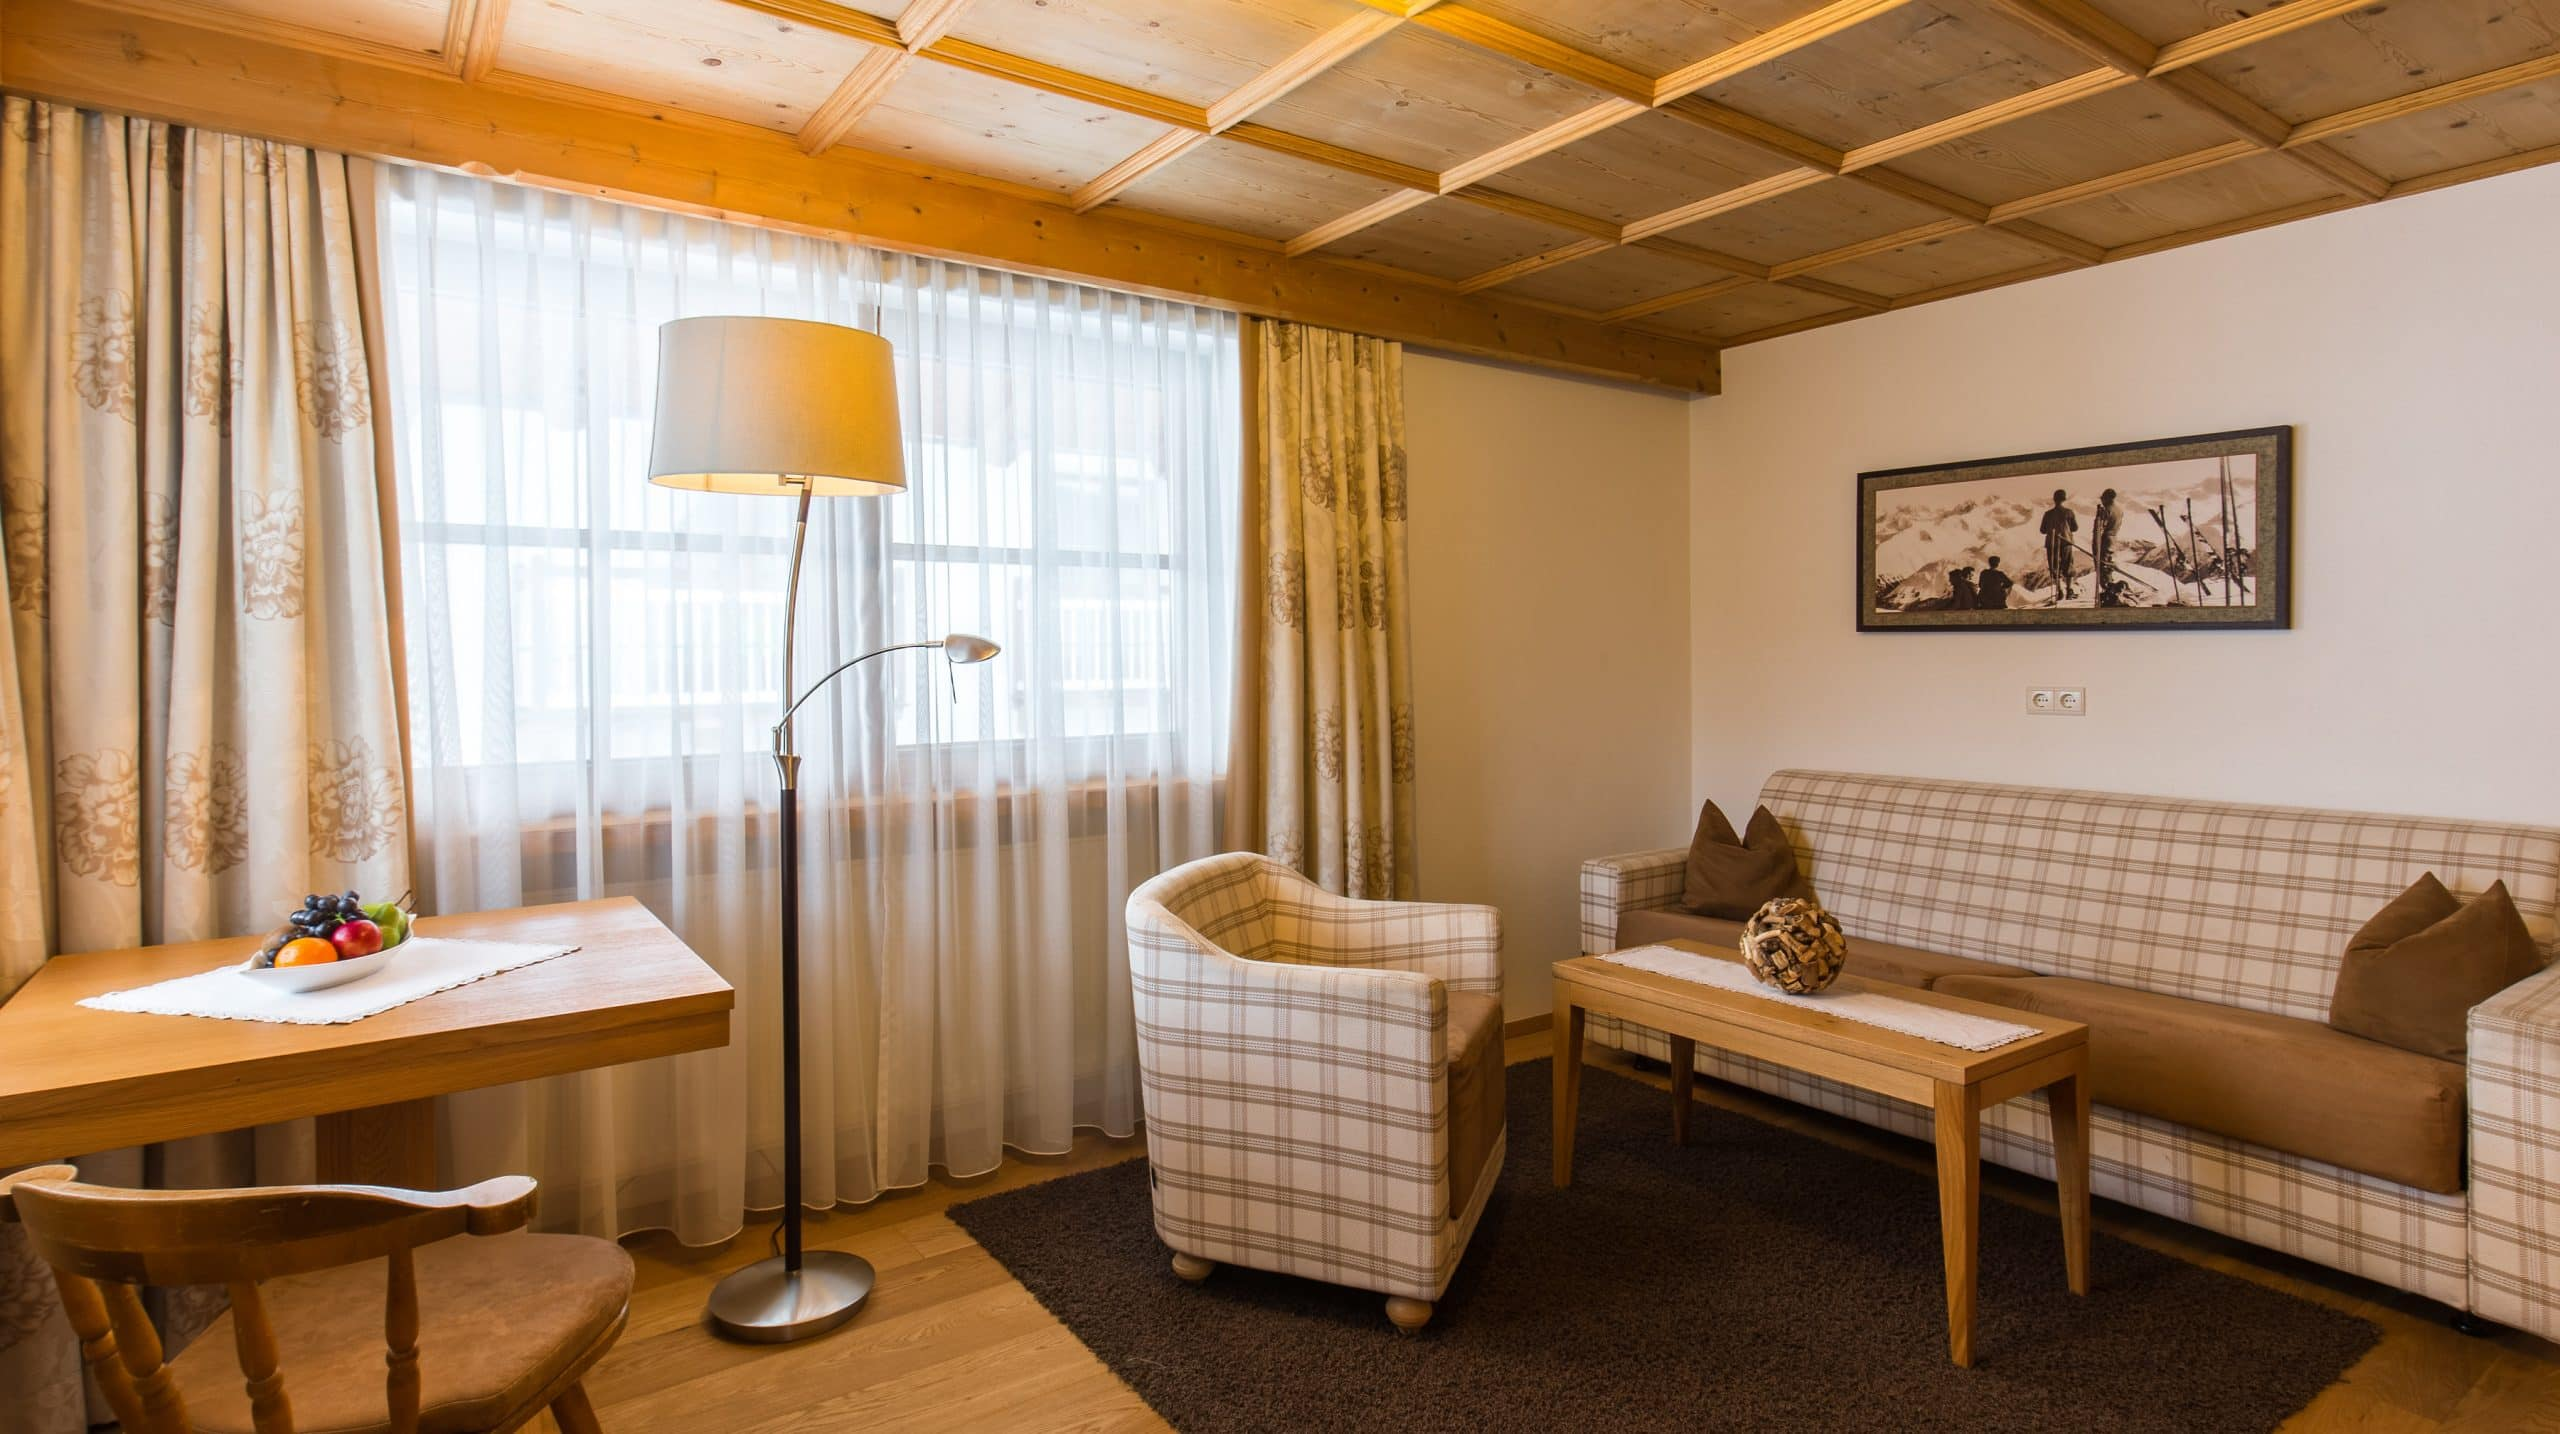 gaspingerhof highlights 2017 66 Zimmer 337 scaled